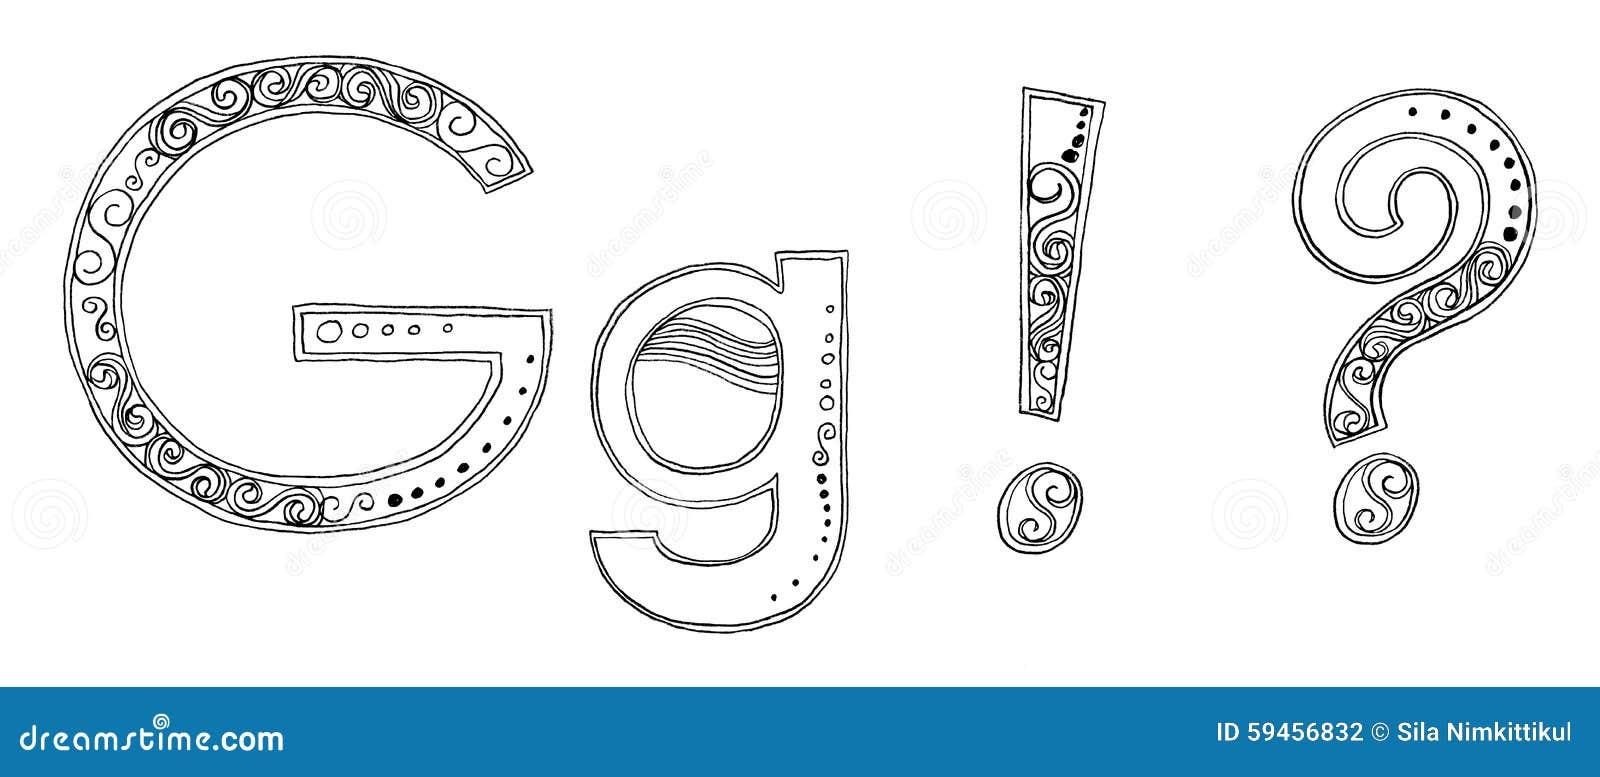 G vandan freehand pencil sketch font stock illustration